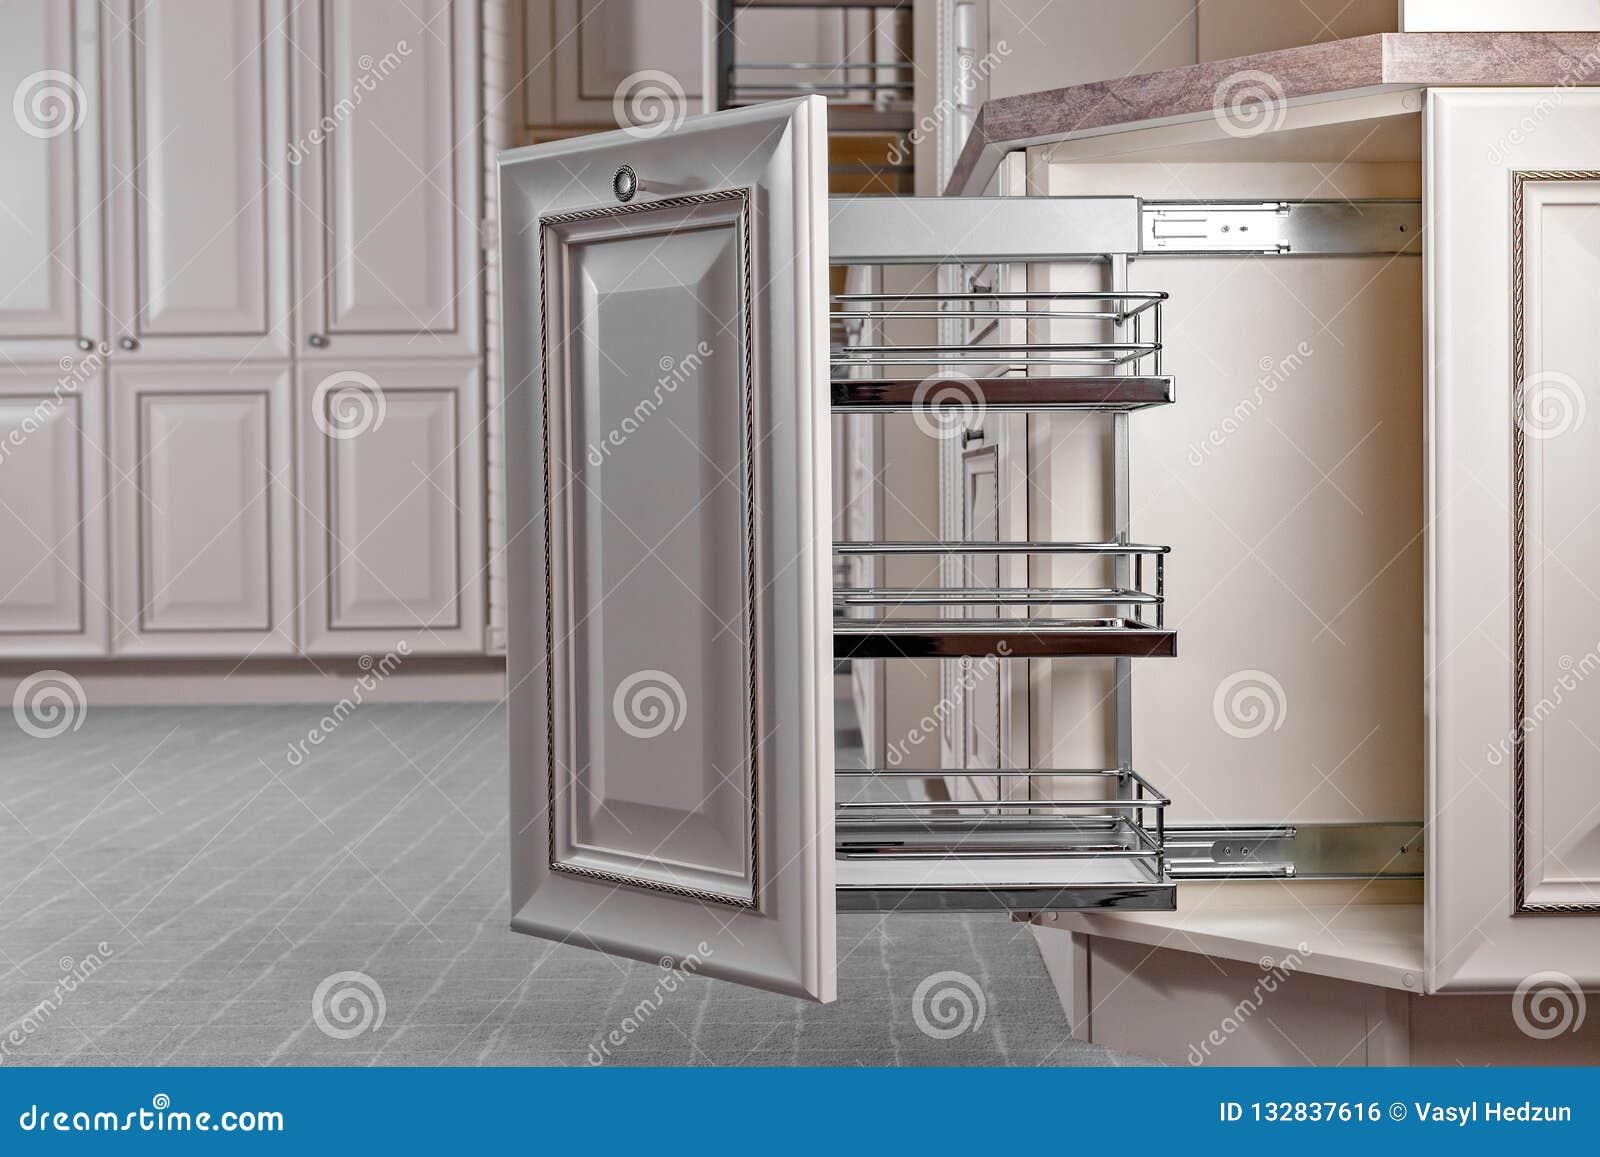 Het binnenland van het huis Keuken - Geopende Deur met Meubilair Hout en het Materiële, Moderne Ontwerp van Chrome